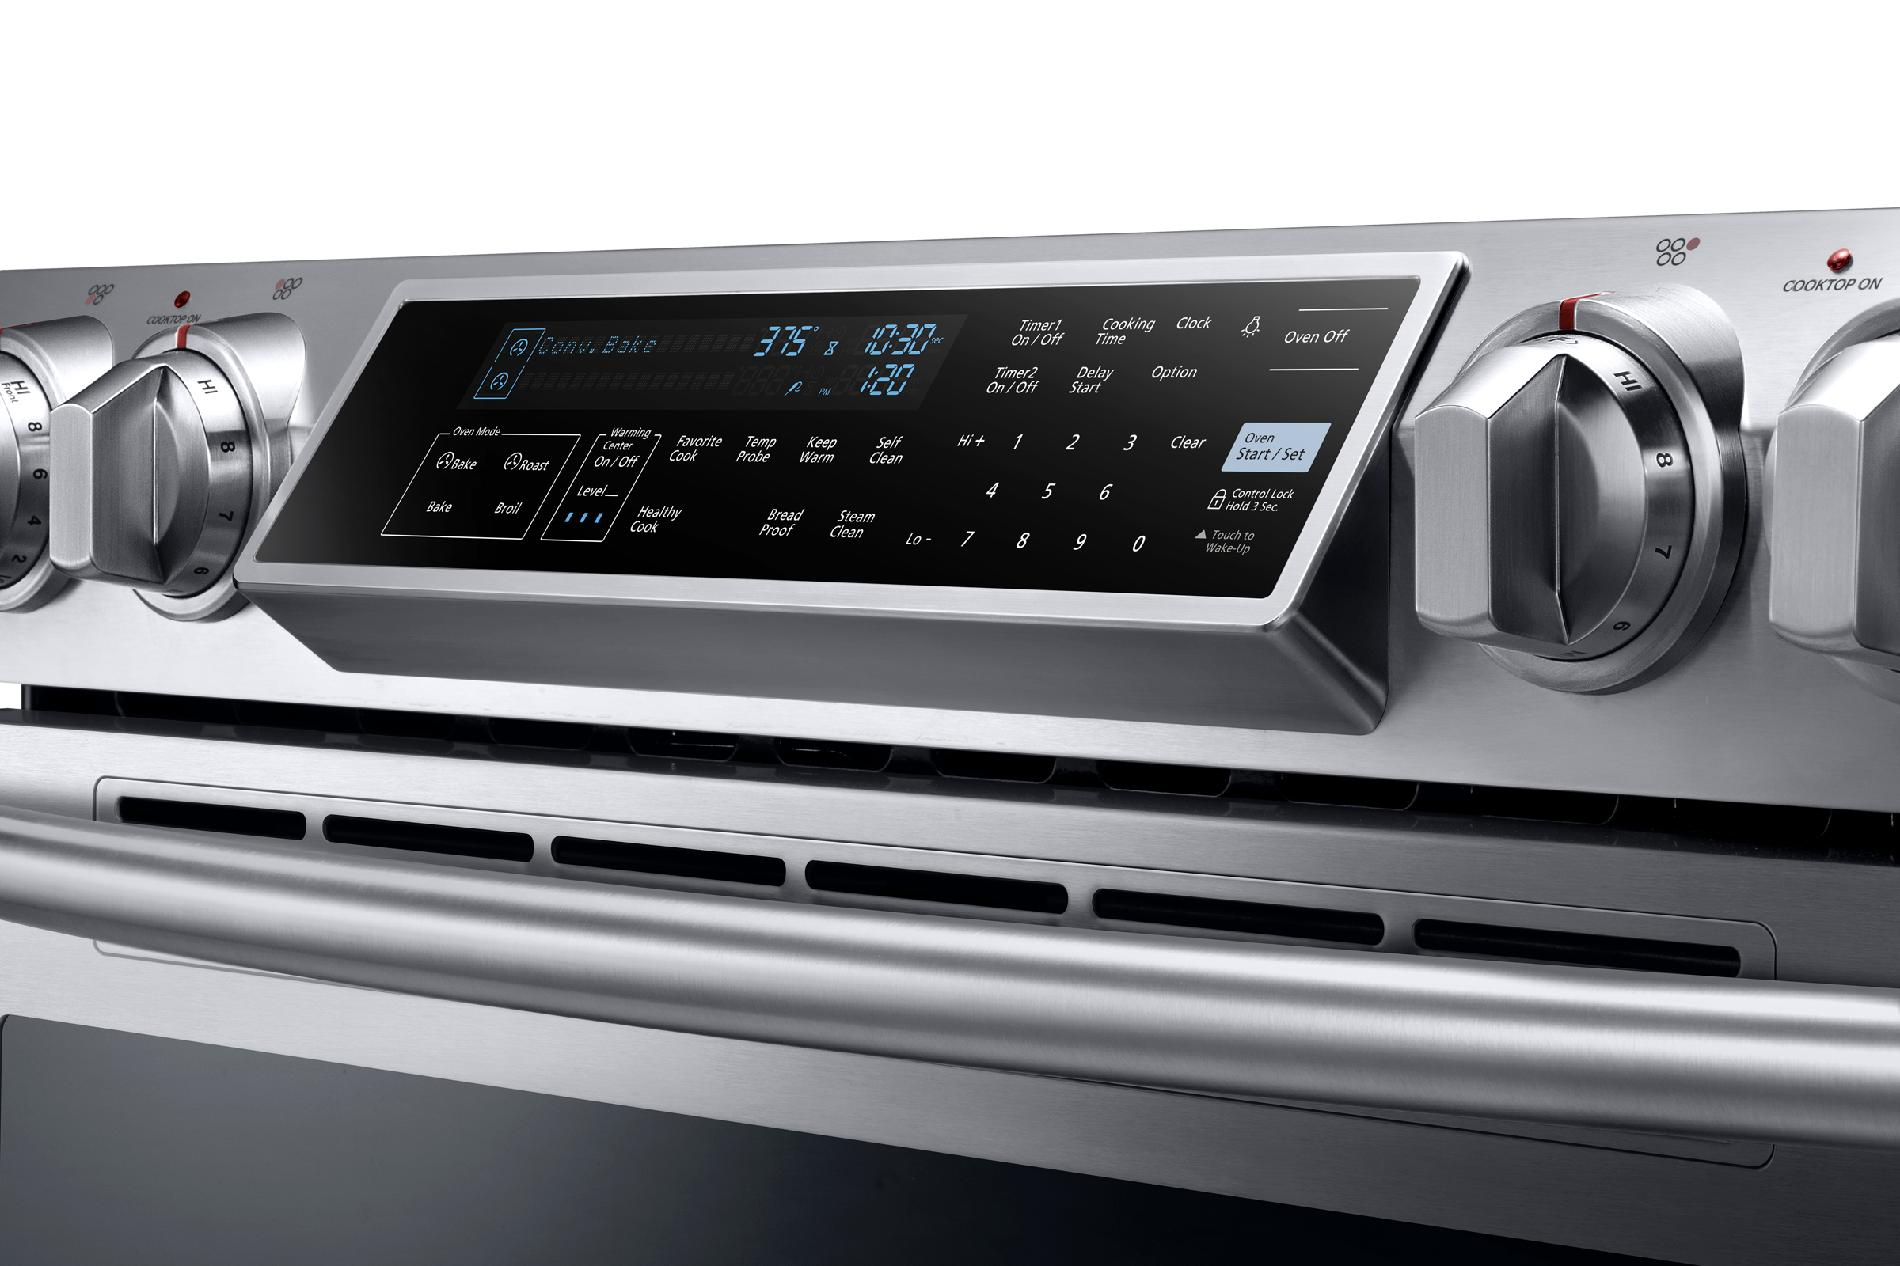 "Samsung 30"" Slide-In Electric Range - Stainless Steel"